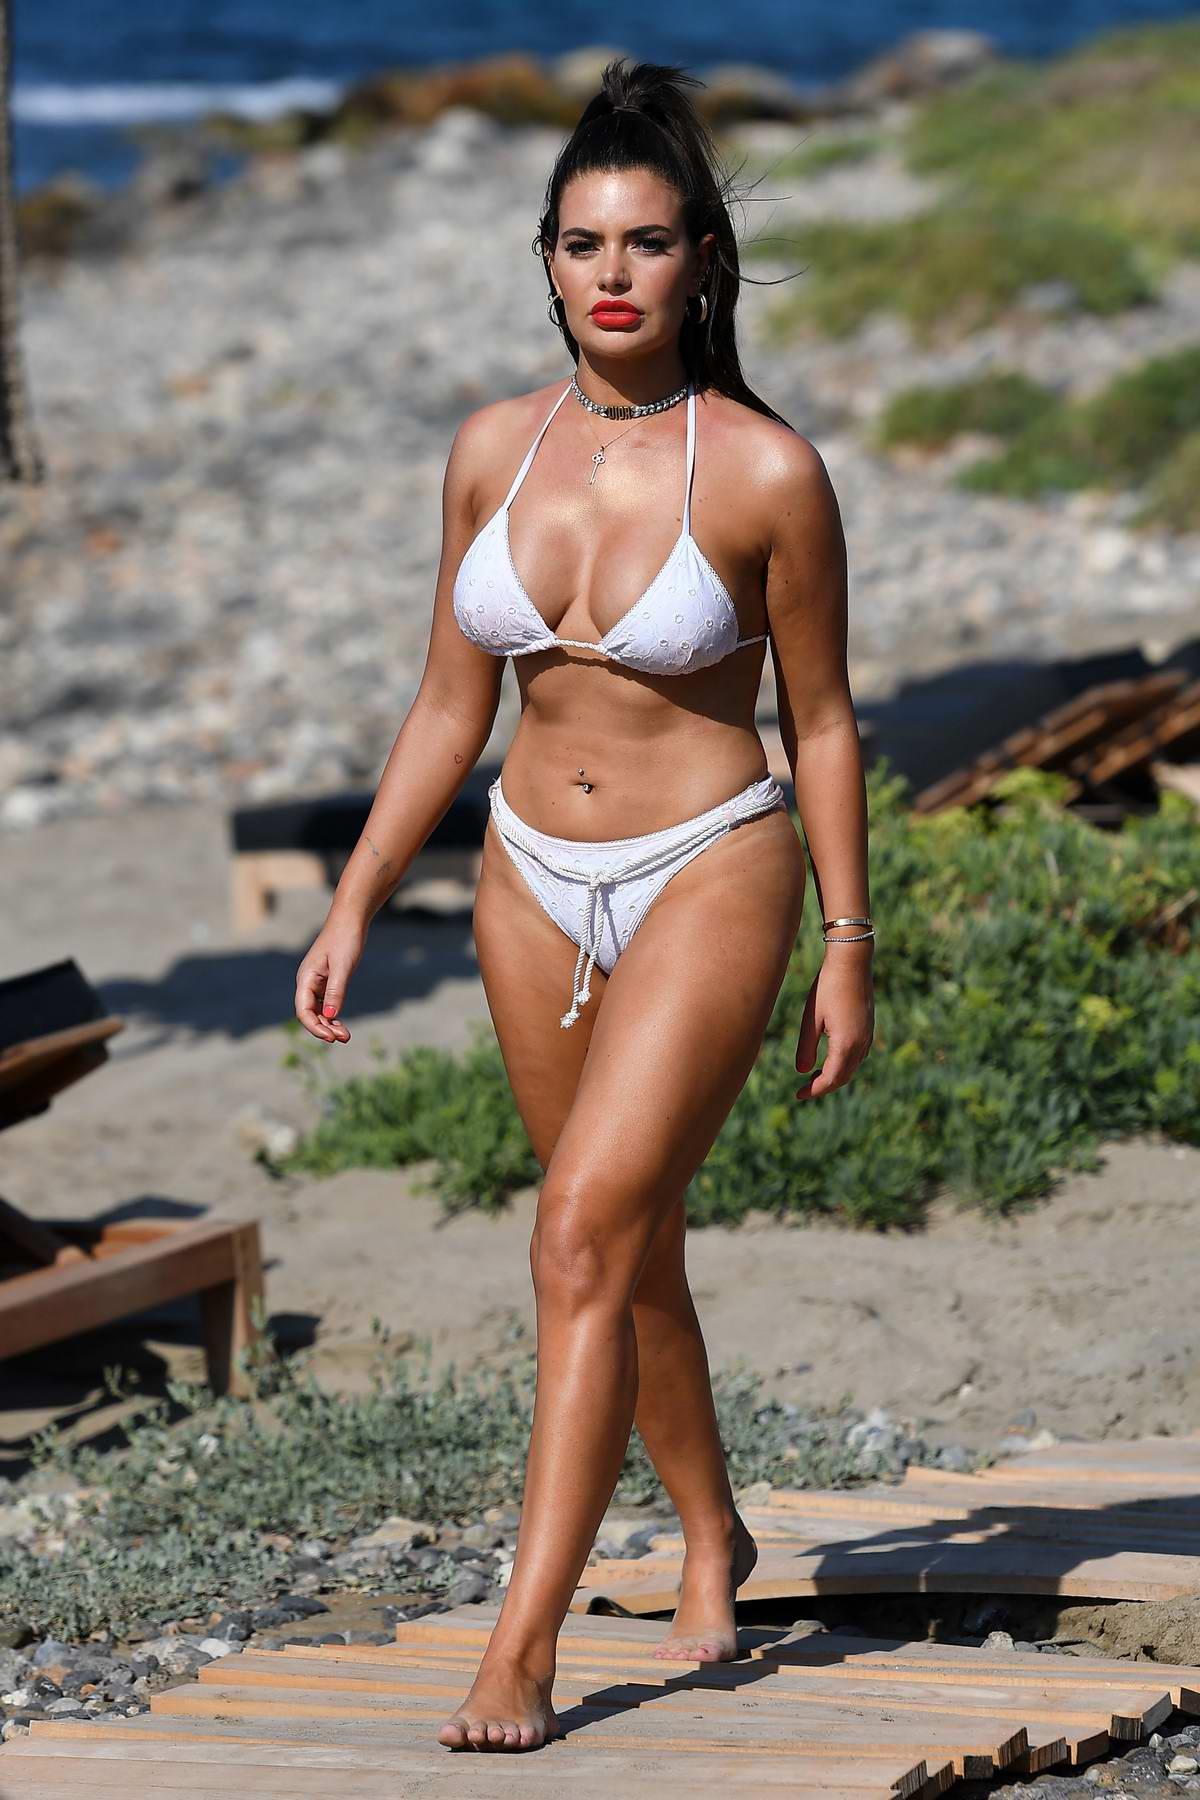 Megan Barton-Hanson sizzles in a white bikini while on the set of 'Celebs Go Dating' TV show in Crete, Greece